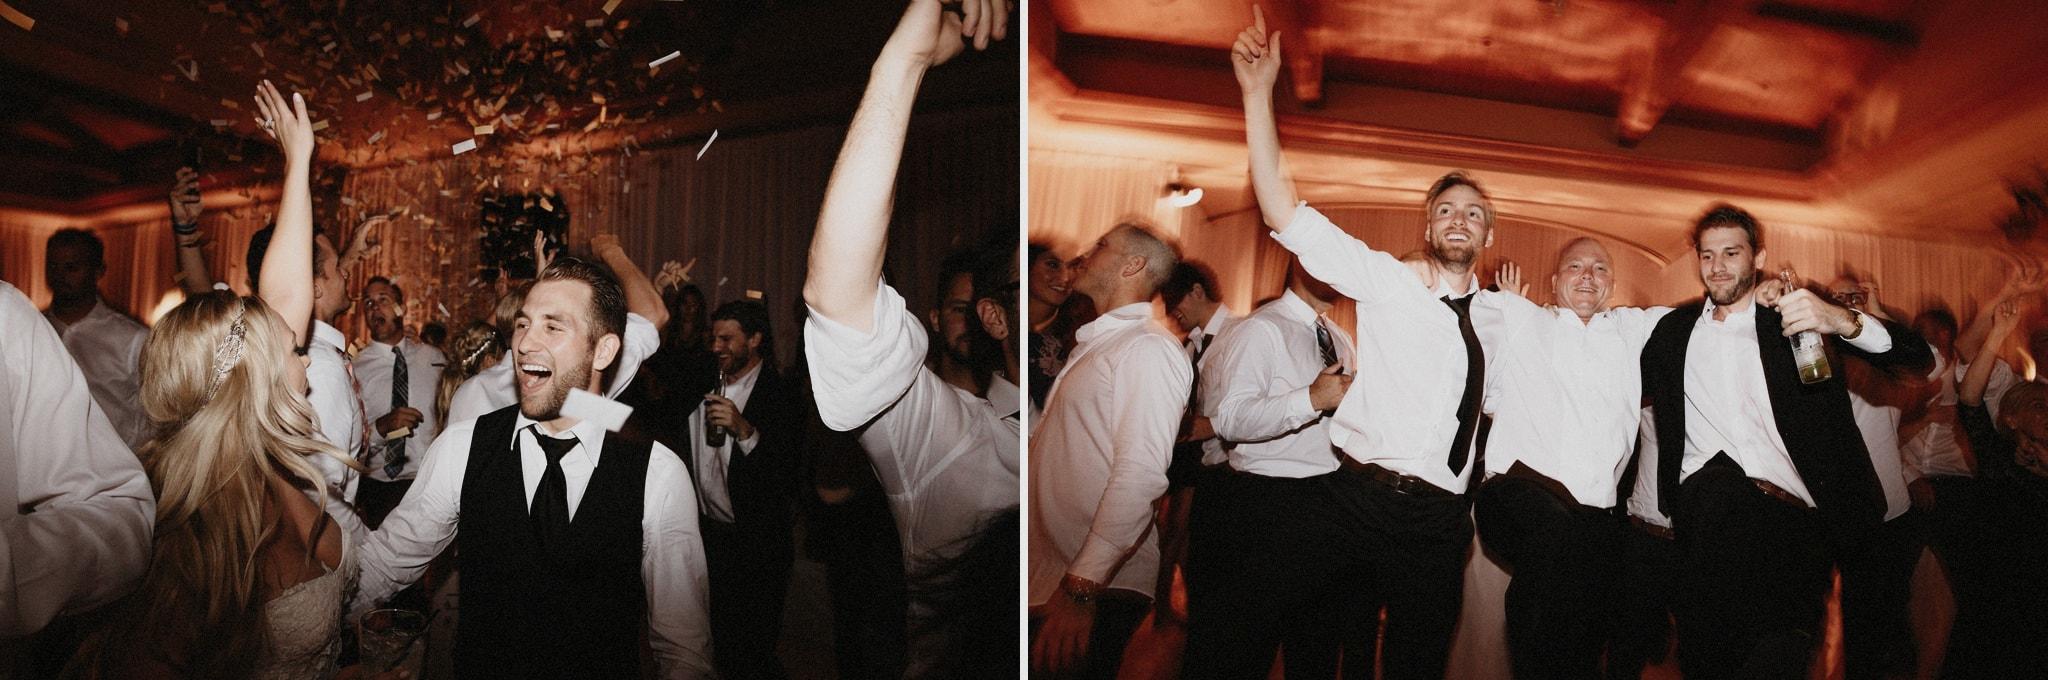 085-wedding-reception-dance-confetti-cannon.jpg